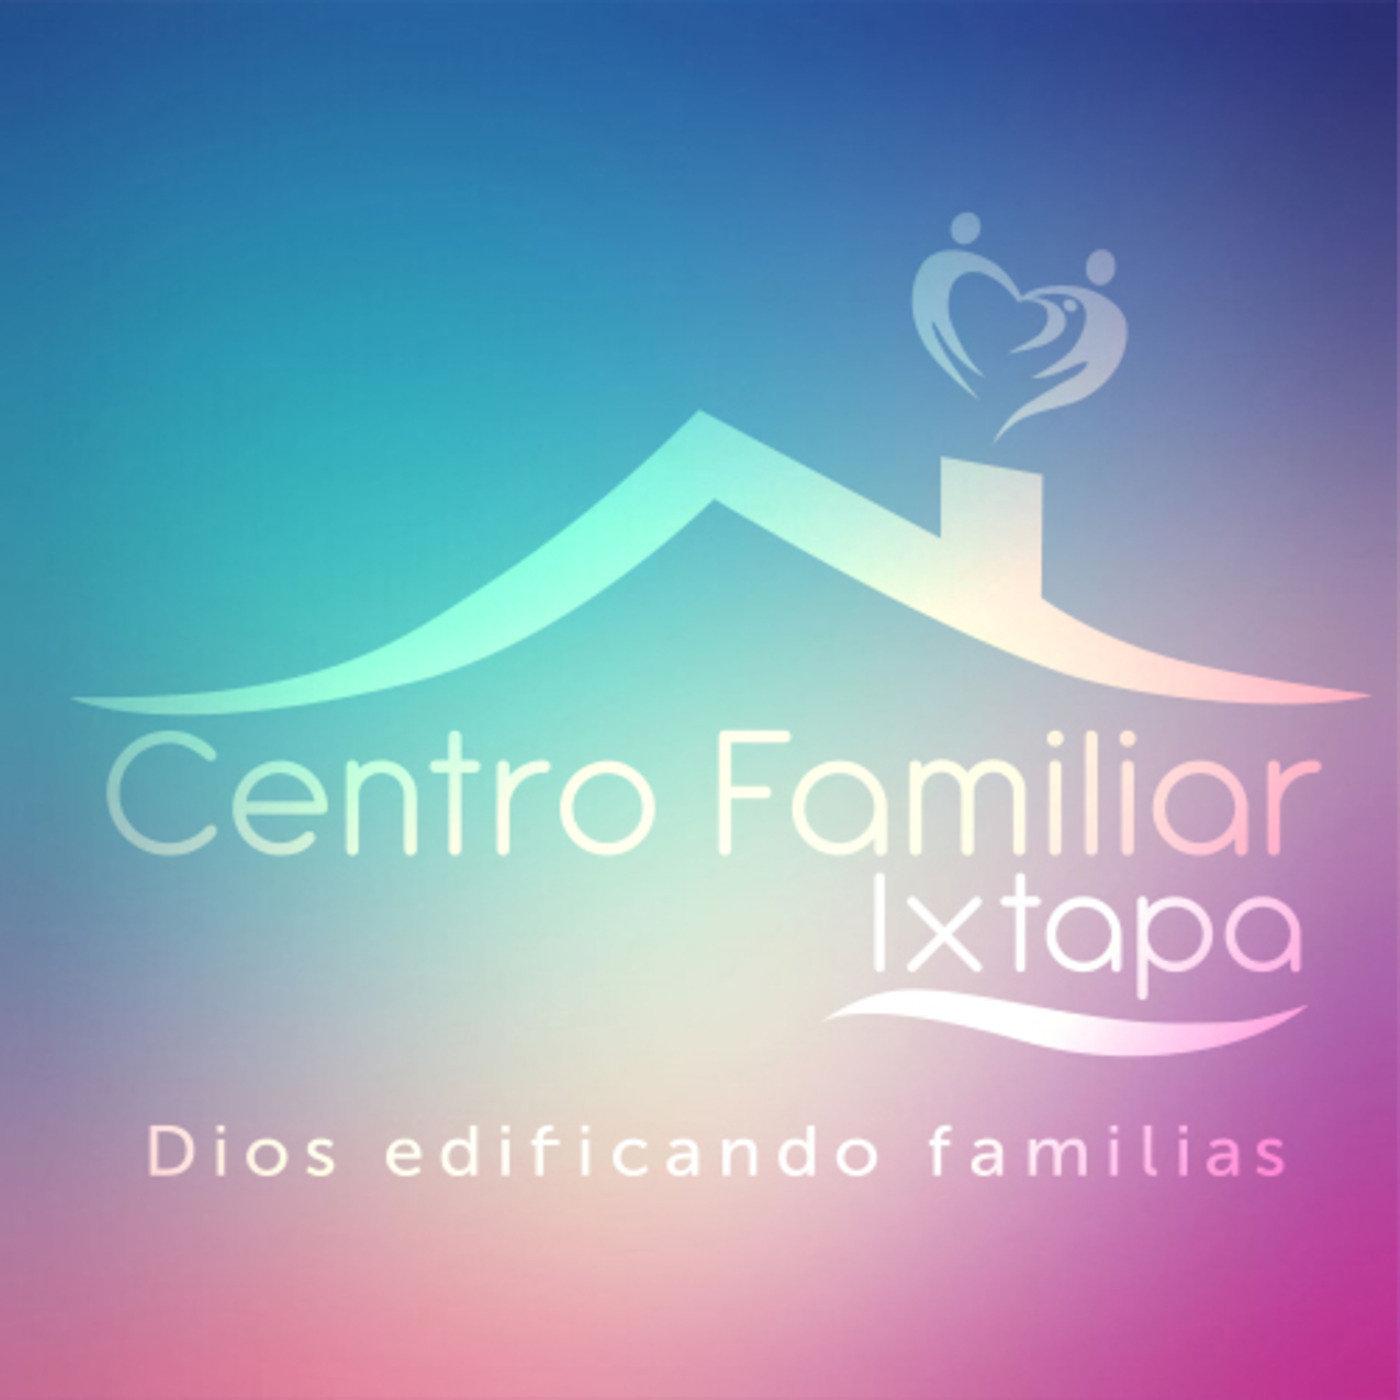 <![CDATA[Centro Familiar Ixtapa ]]>